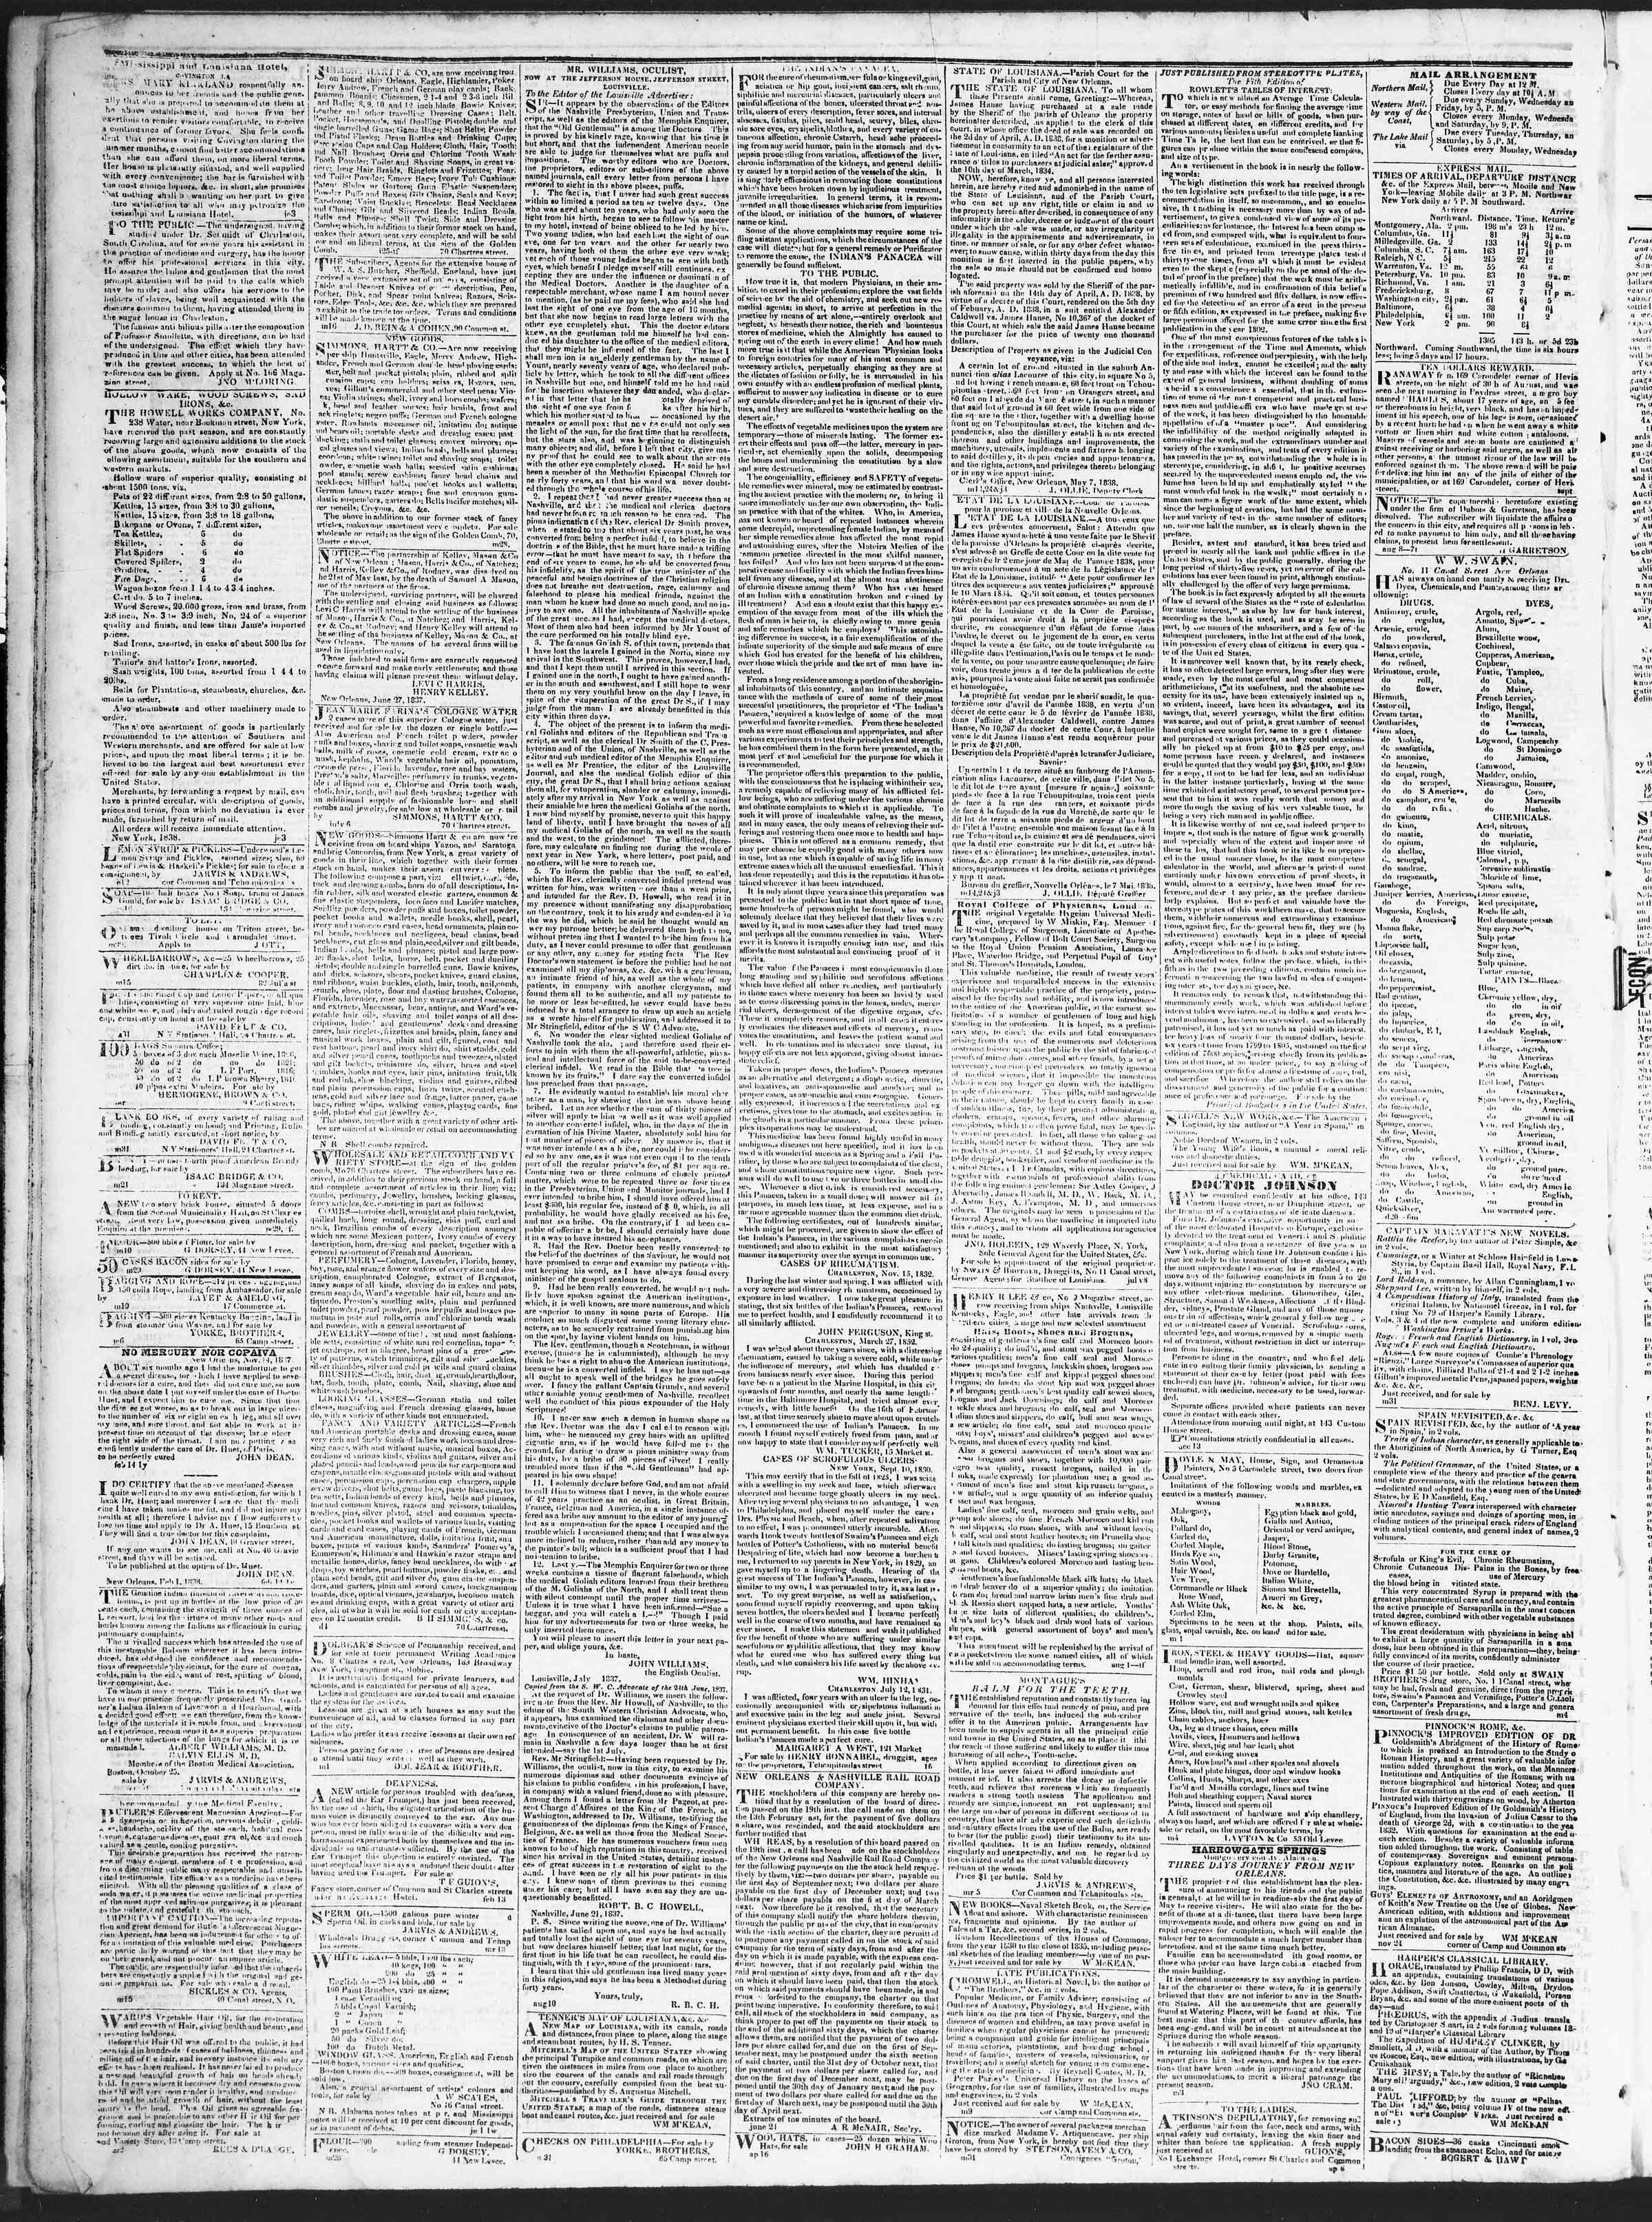 August 9, 1838 Tarihli True American Gazetesi Sayfa 4